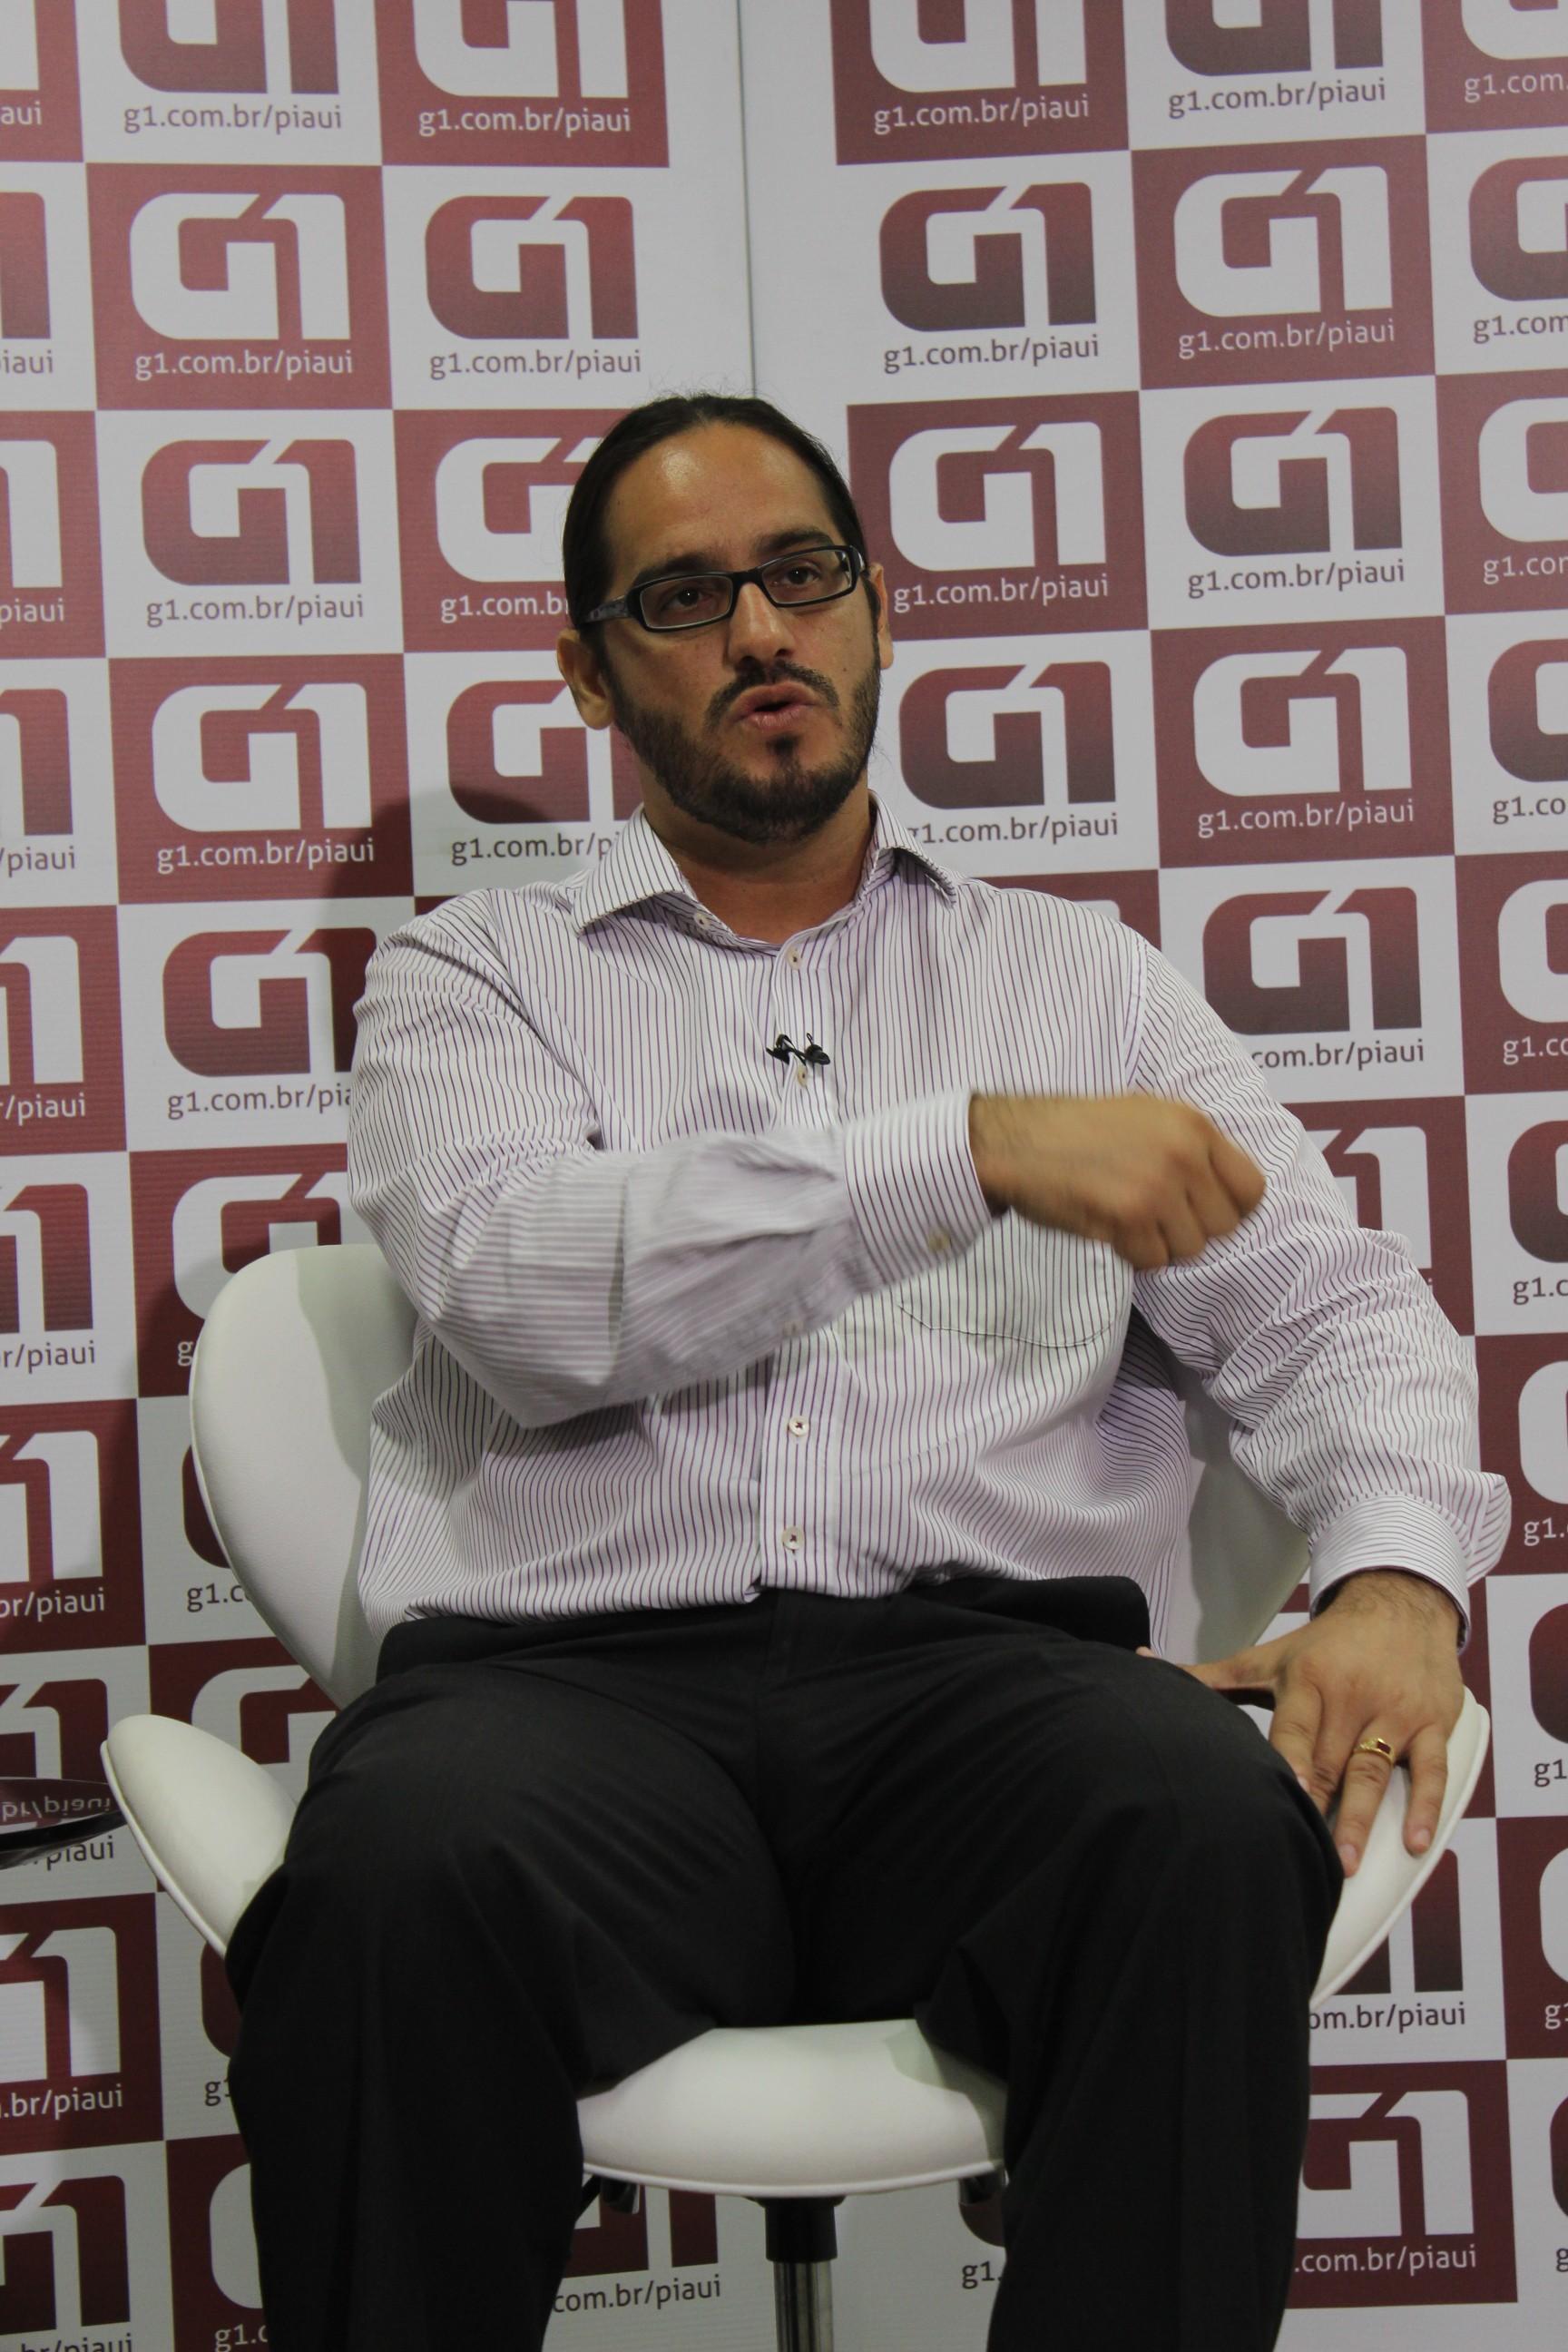 Maklandel durante entrevista ao portal G1 (Foto: Jaqueliny Siqueira/ G1)